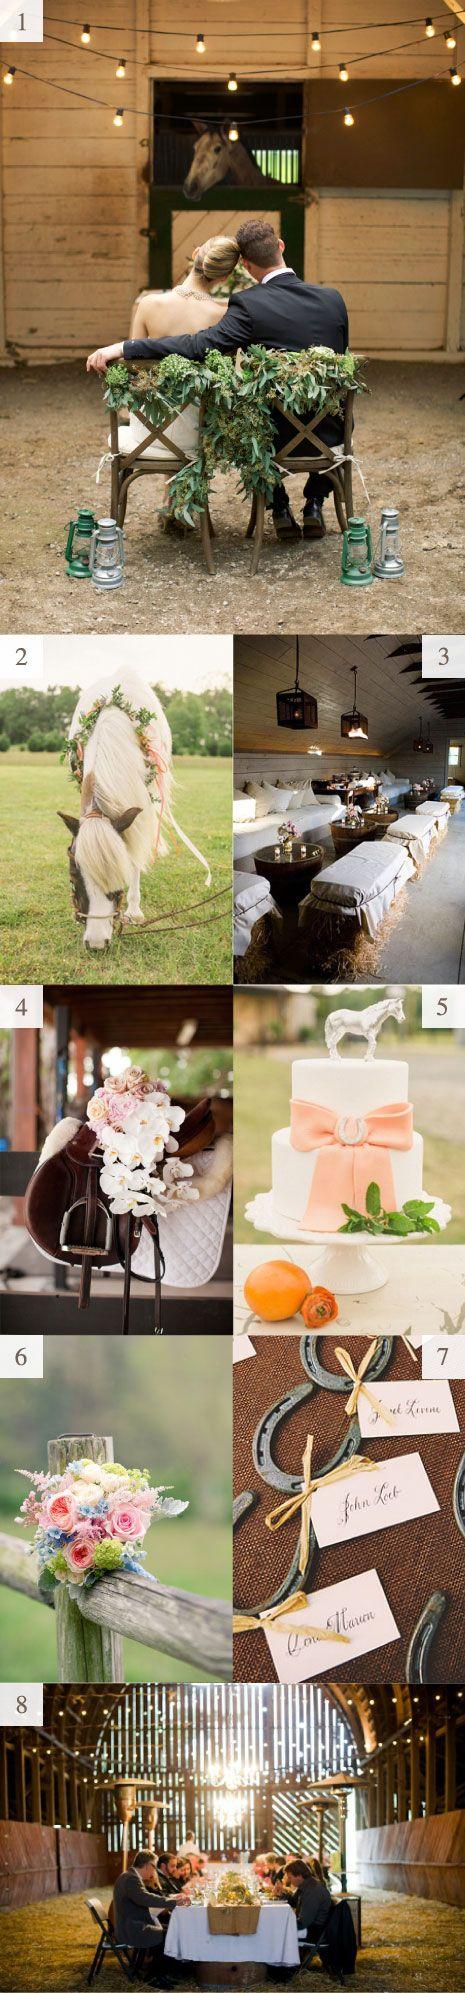 Butler barn wedding oregon   best Equestrian Wedding images on Pinterest  Horses Cowgirl